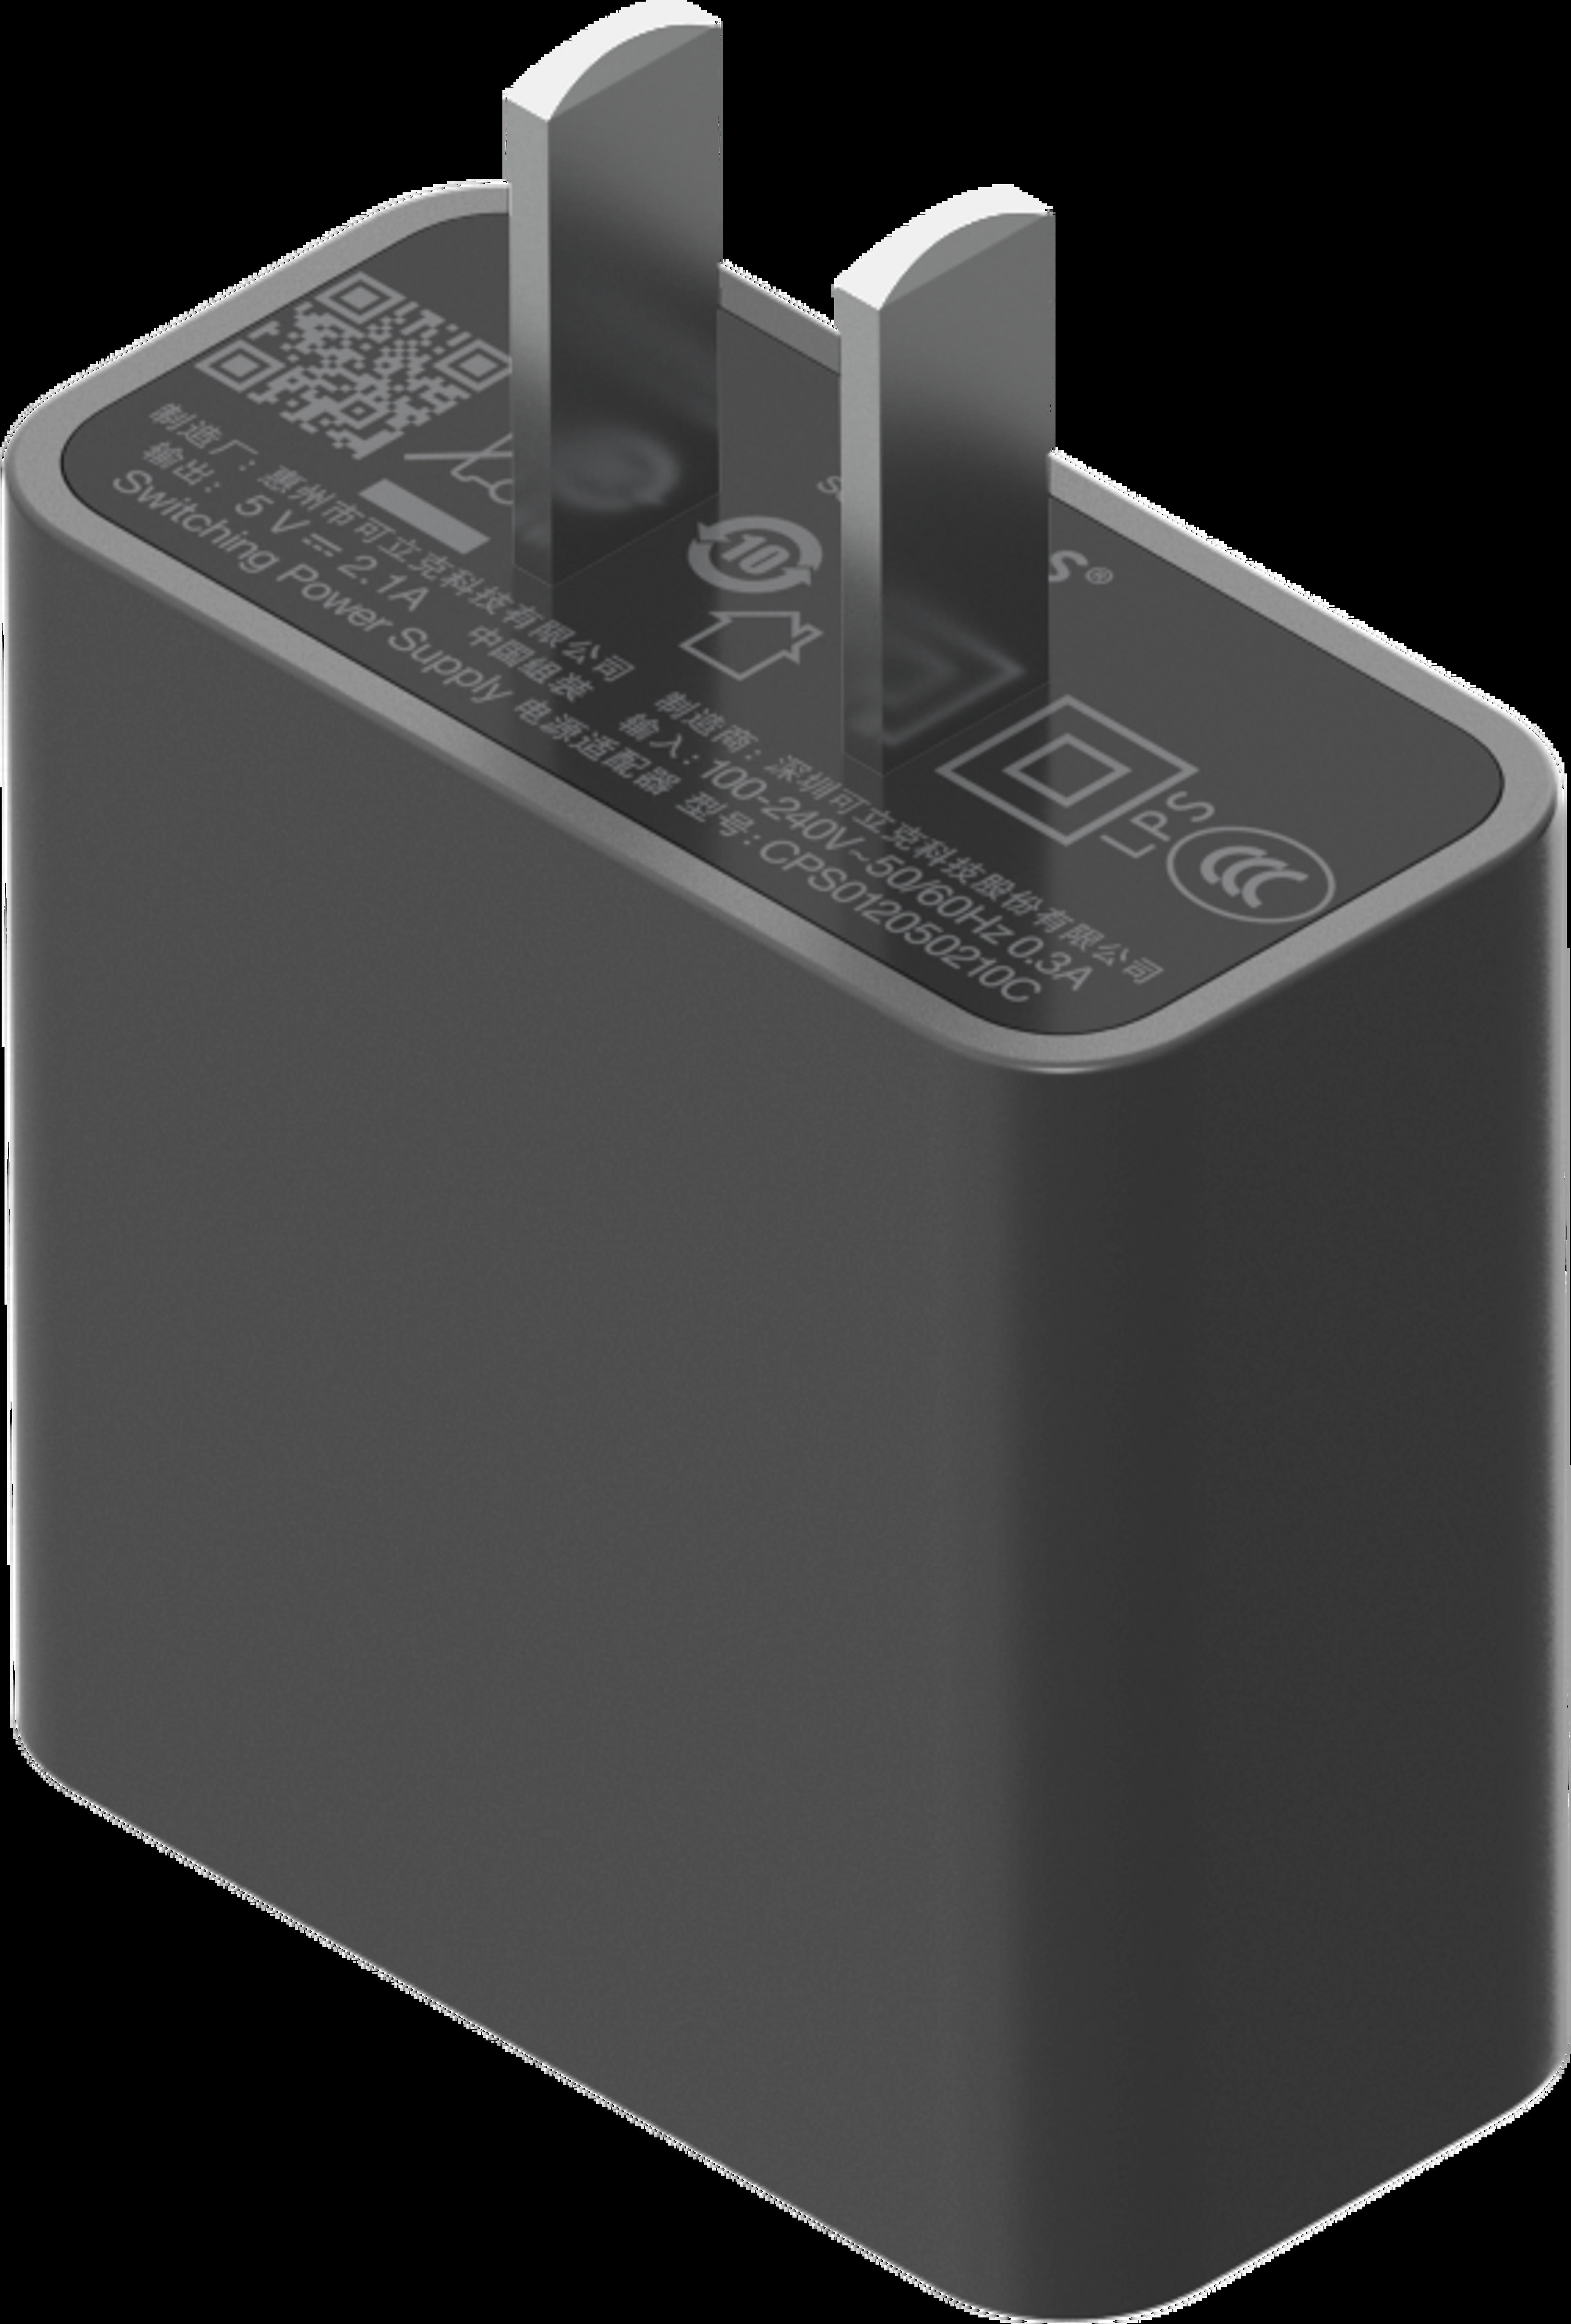 Roam 10W USB电源适配器Shadow Black